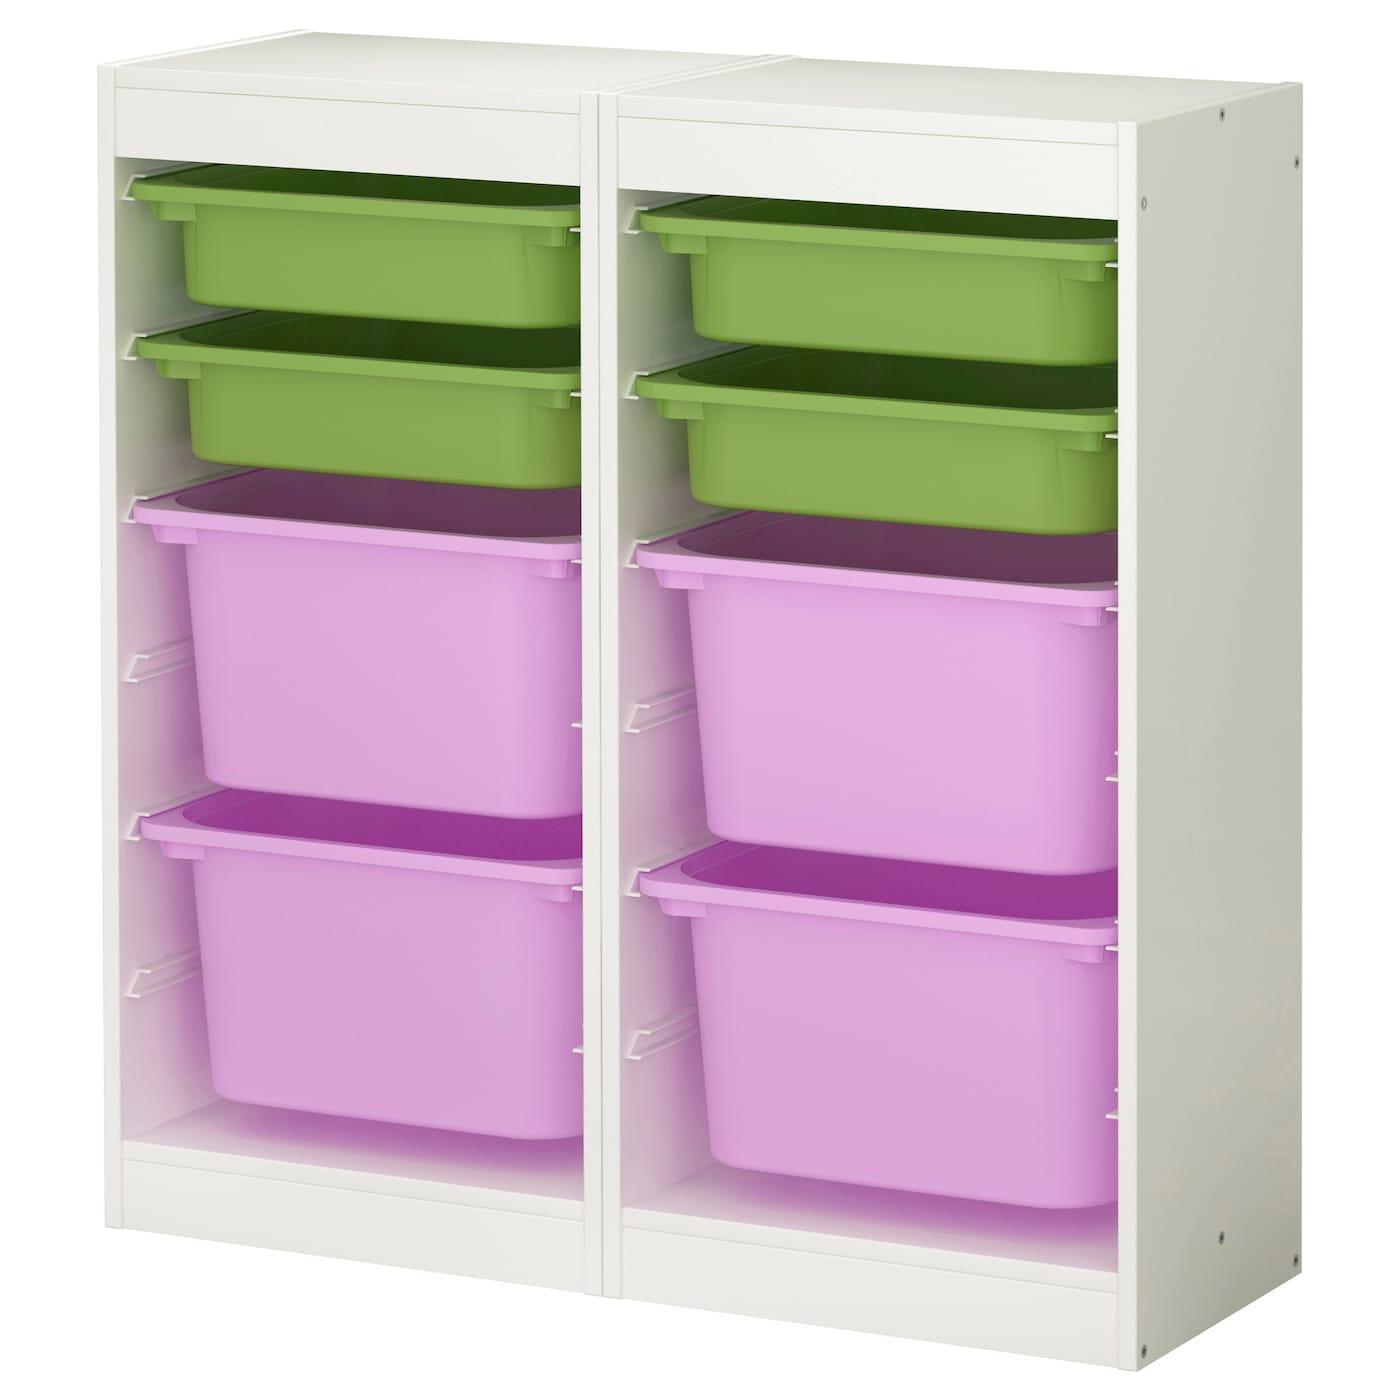 trofast storage combination white multicolour 92x30x94 cm ikea. Black Bedroom Furniture Sets. Home Design Ideas